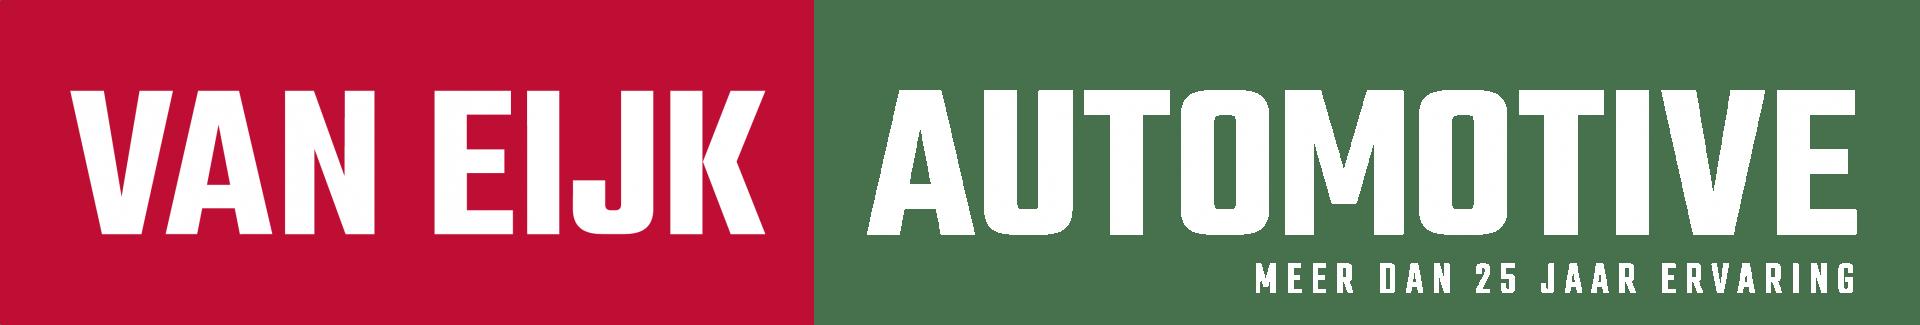 VAN EIJK AUTOMOTIVE